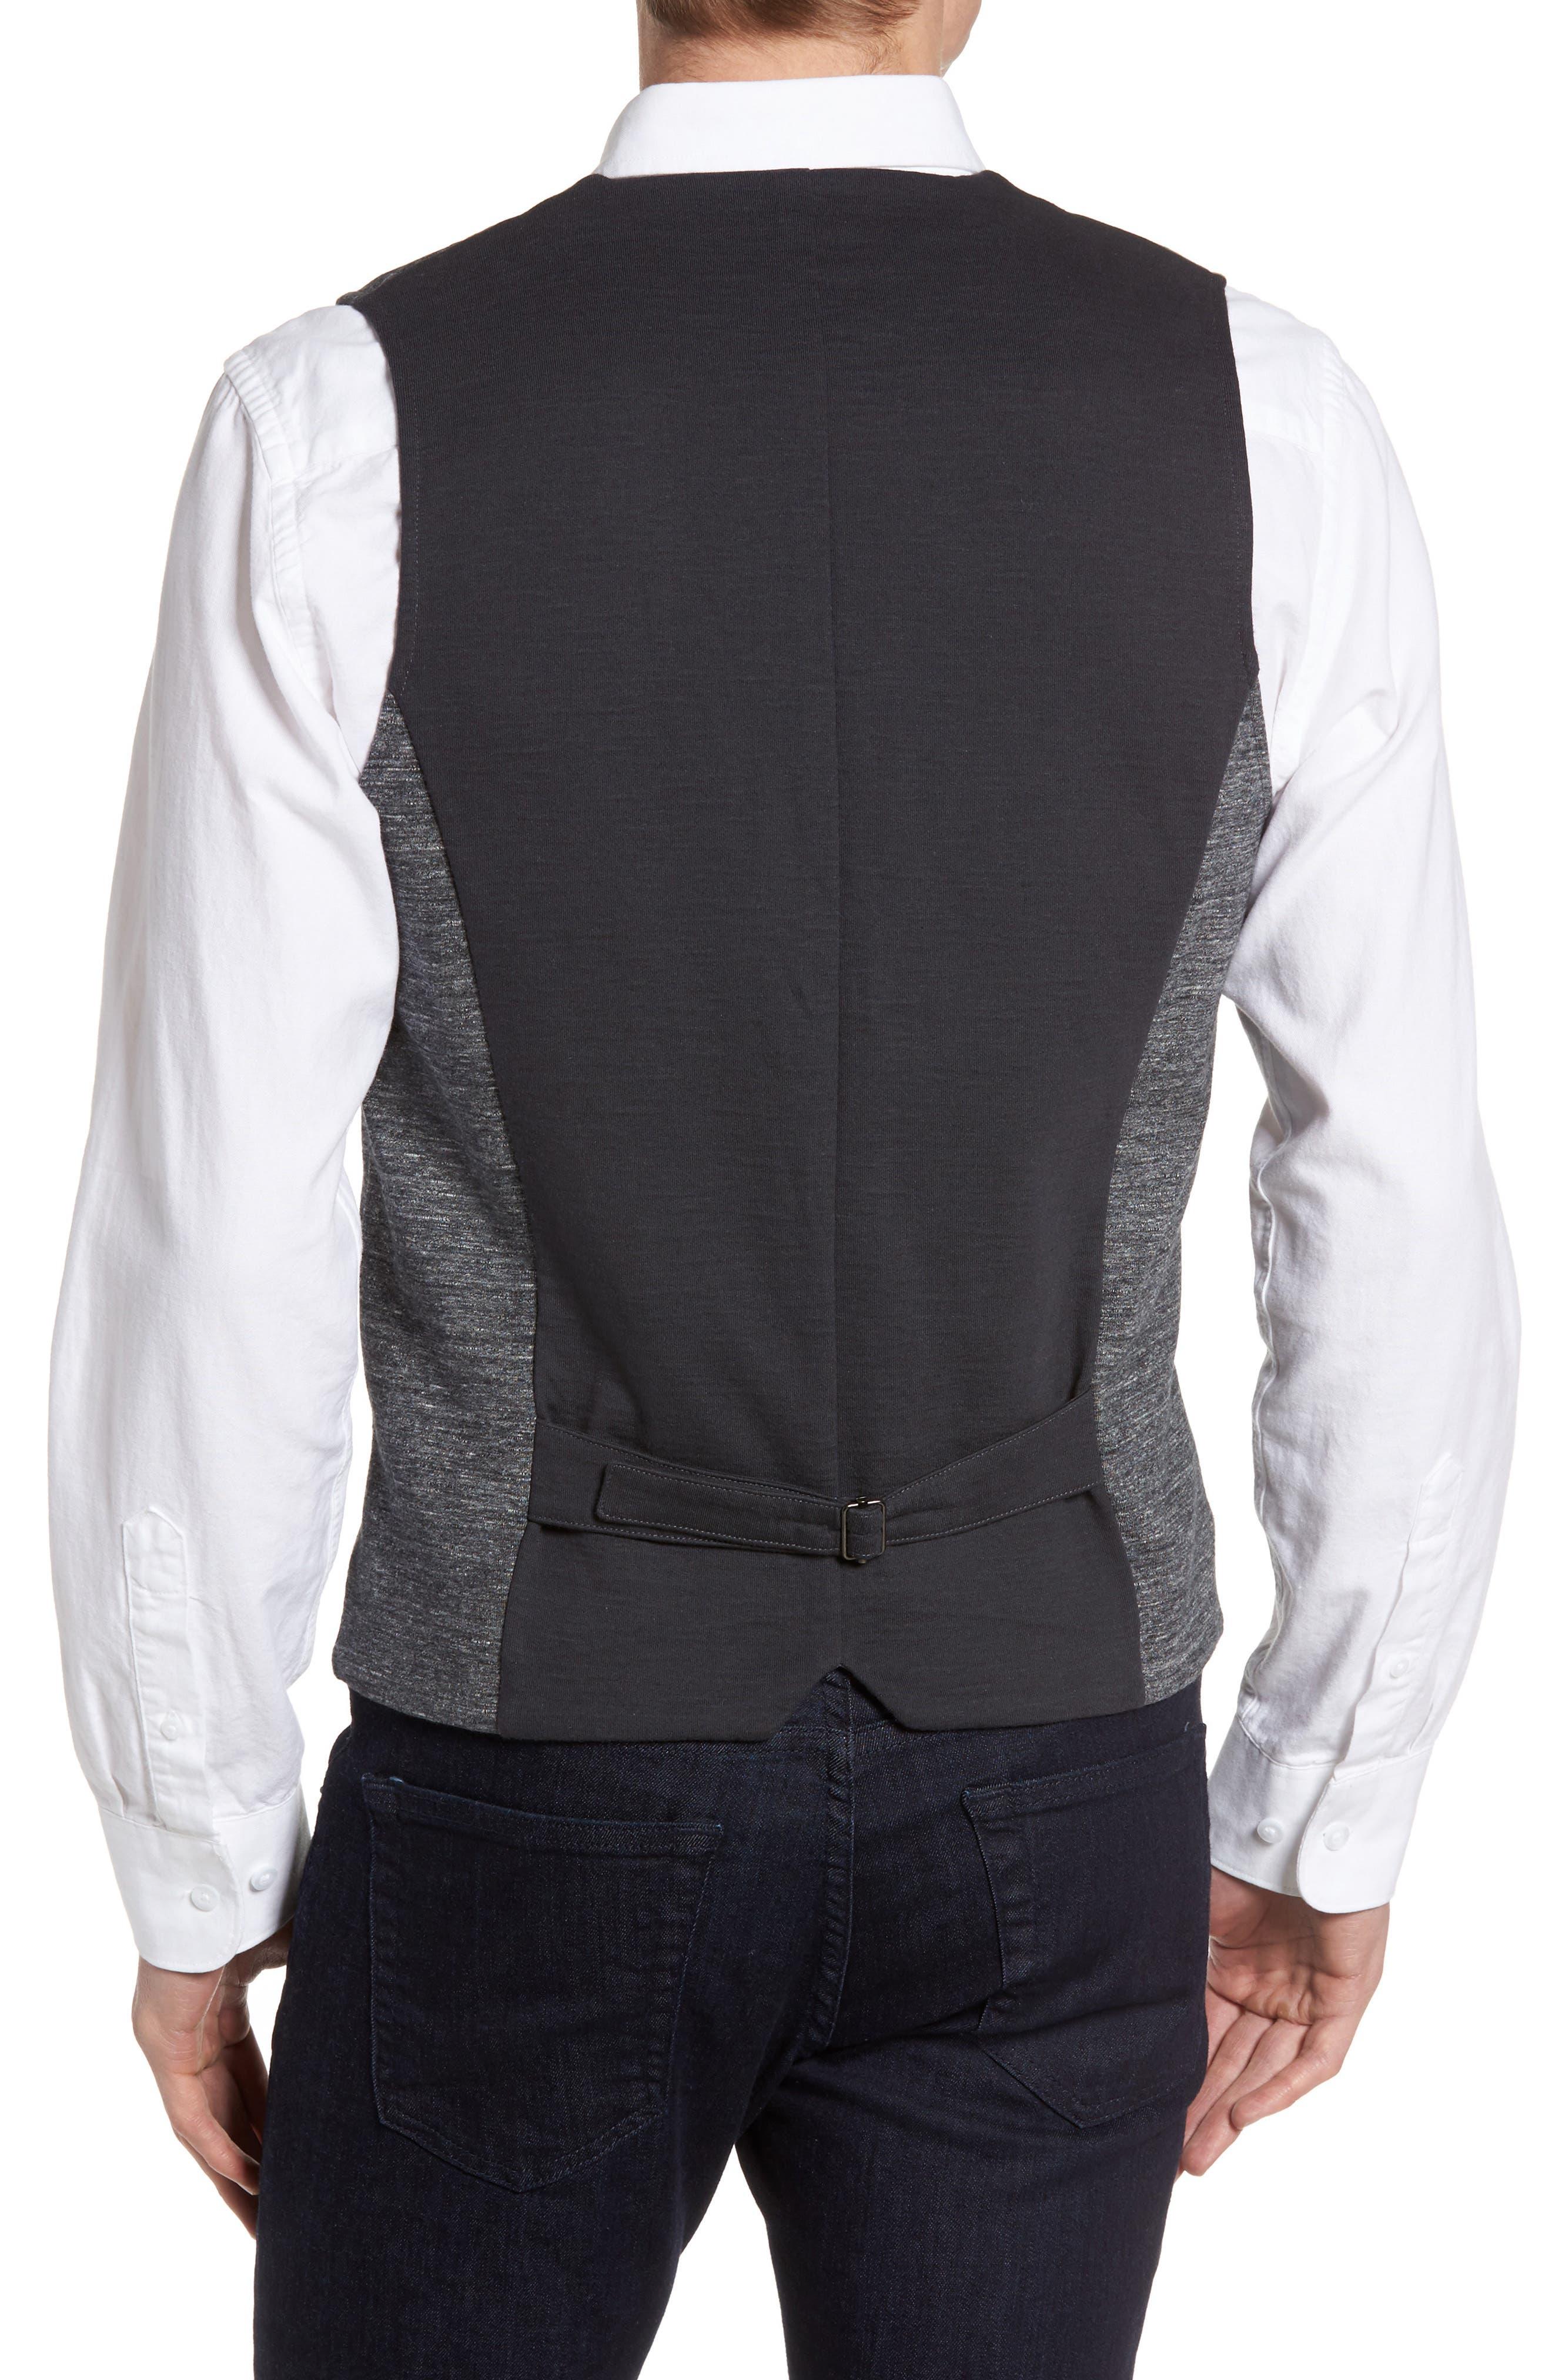 Wutang Jersey Vest,                             Alternate thumbnail 2, color,                             051